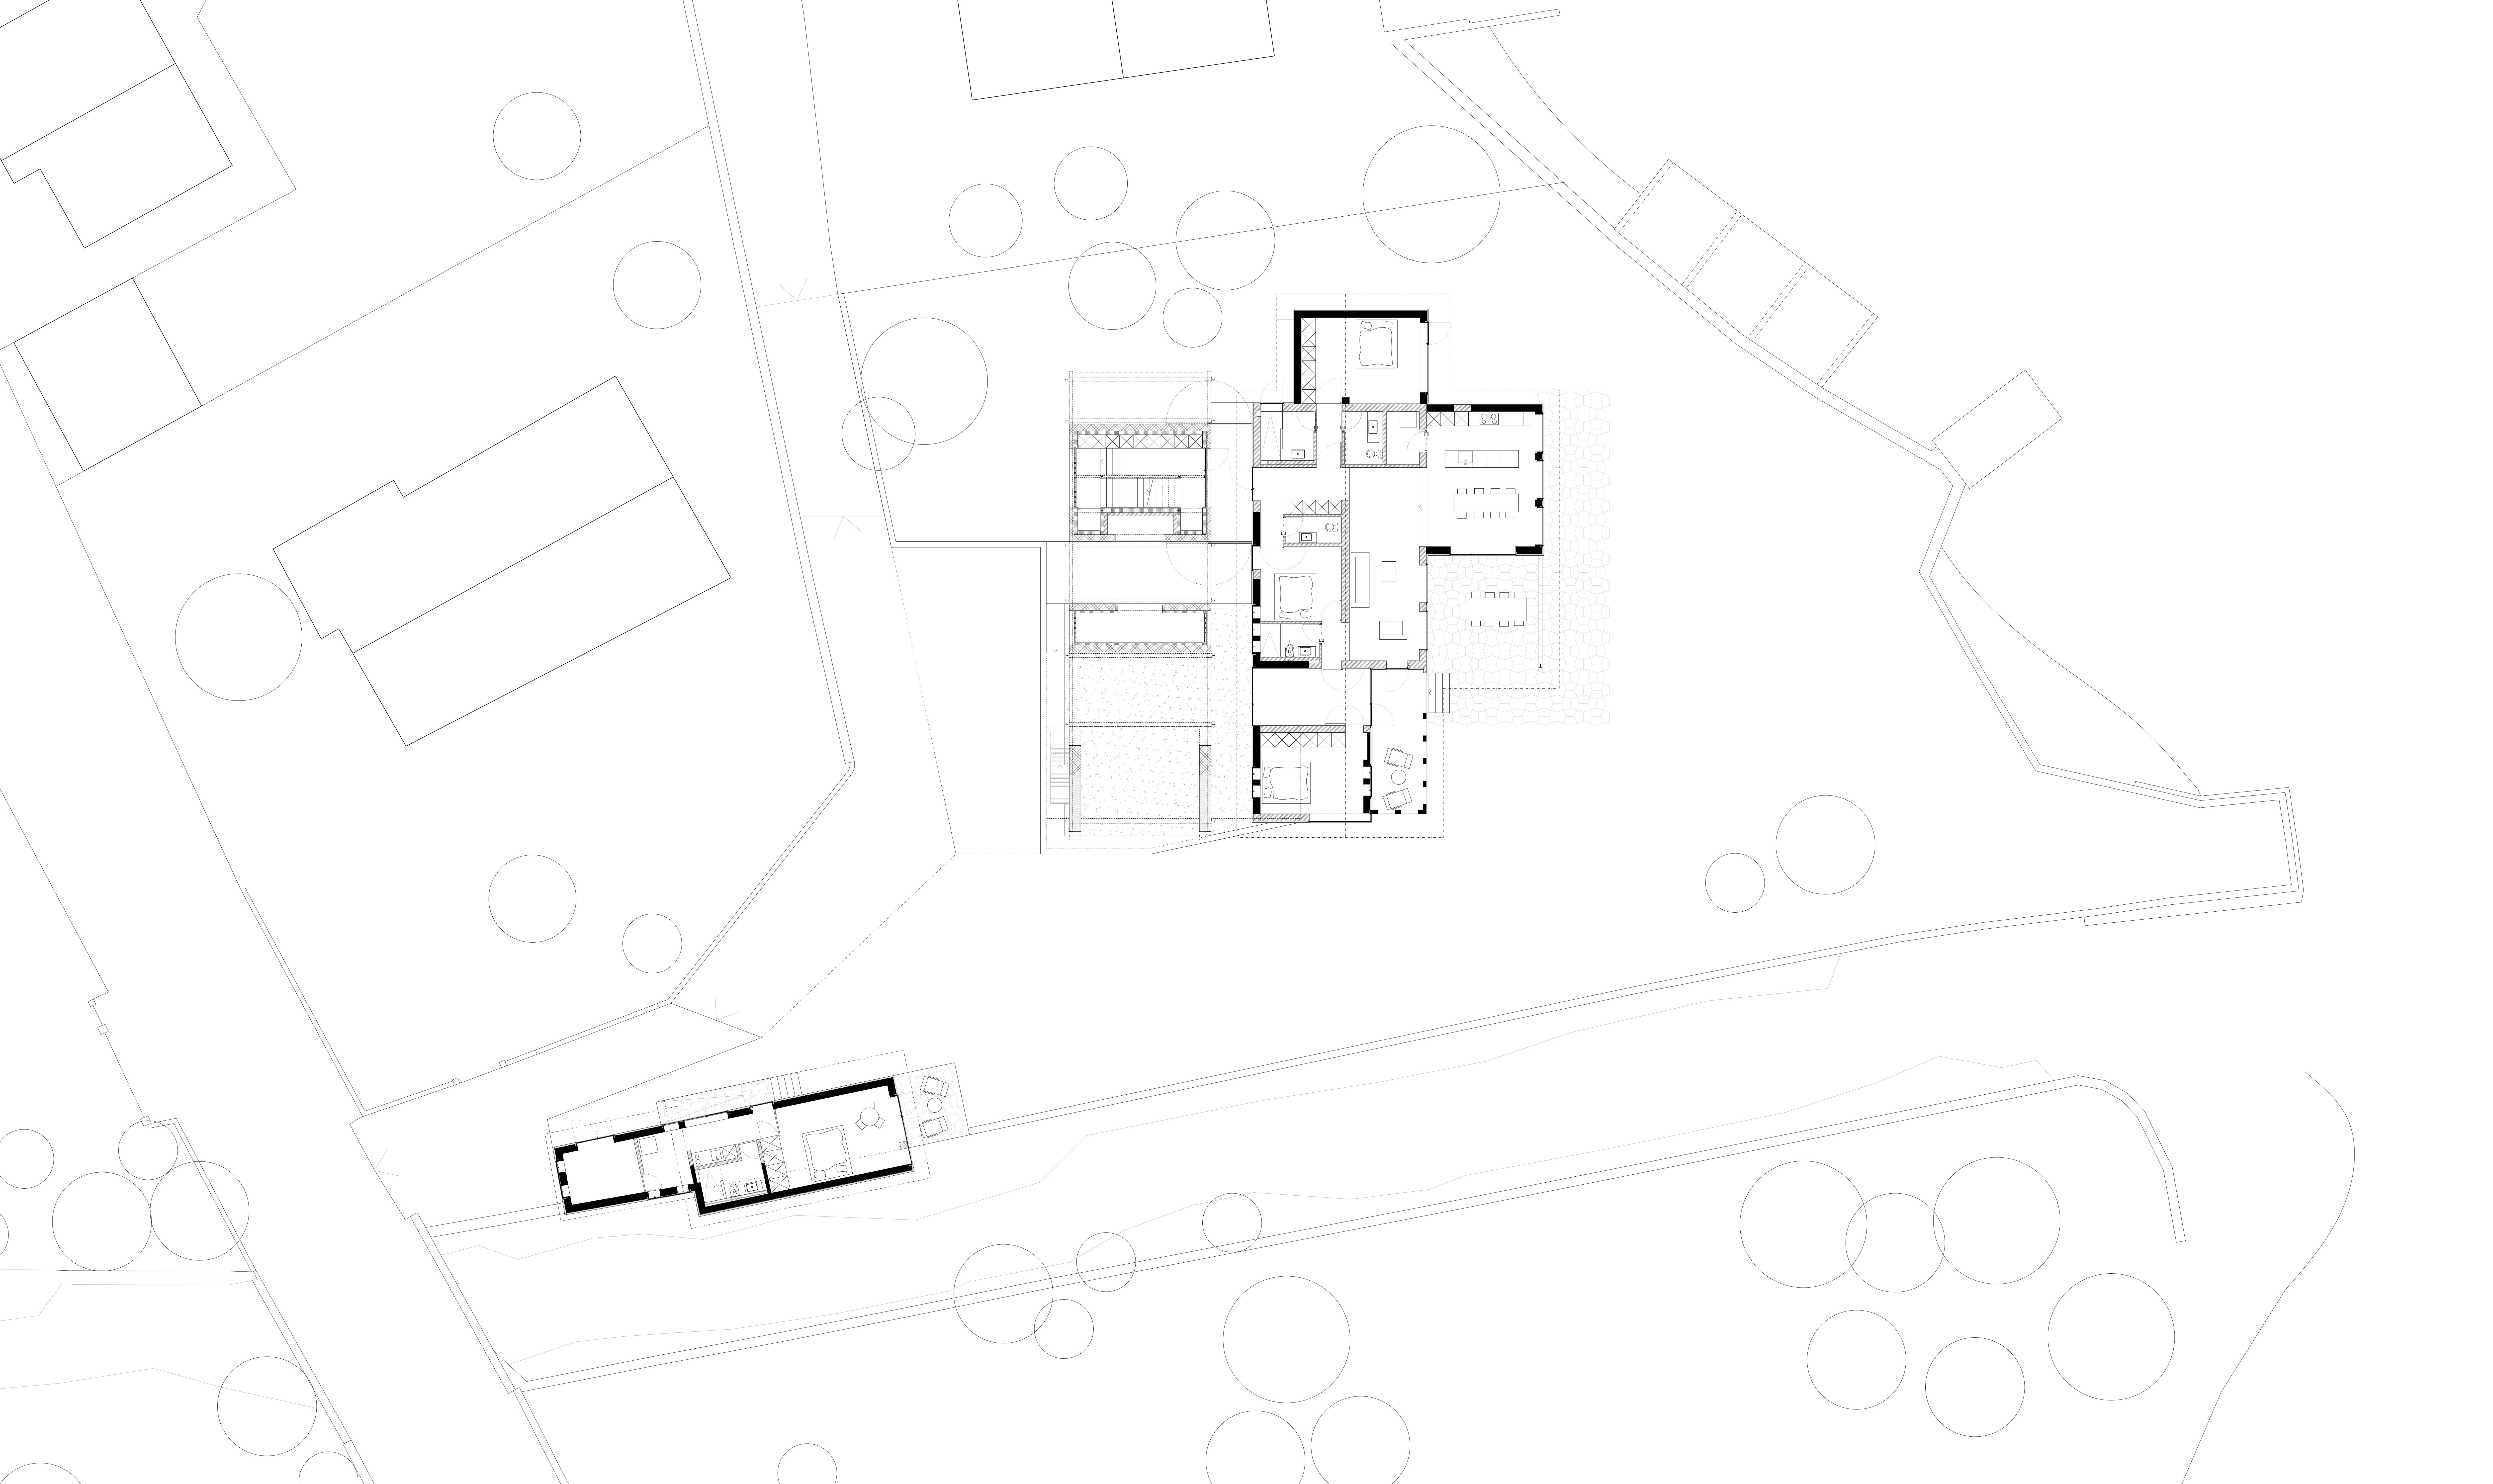 LEIBUNDGUT ARCHITEKTEN